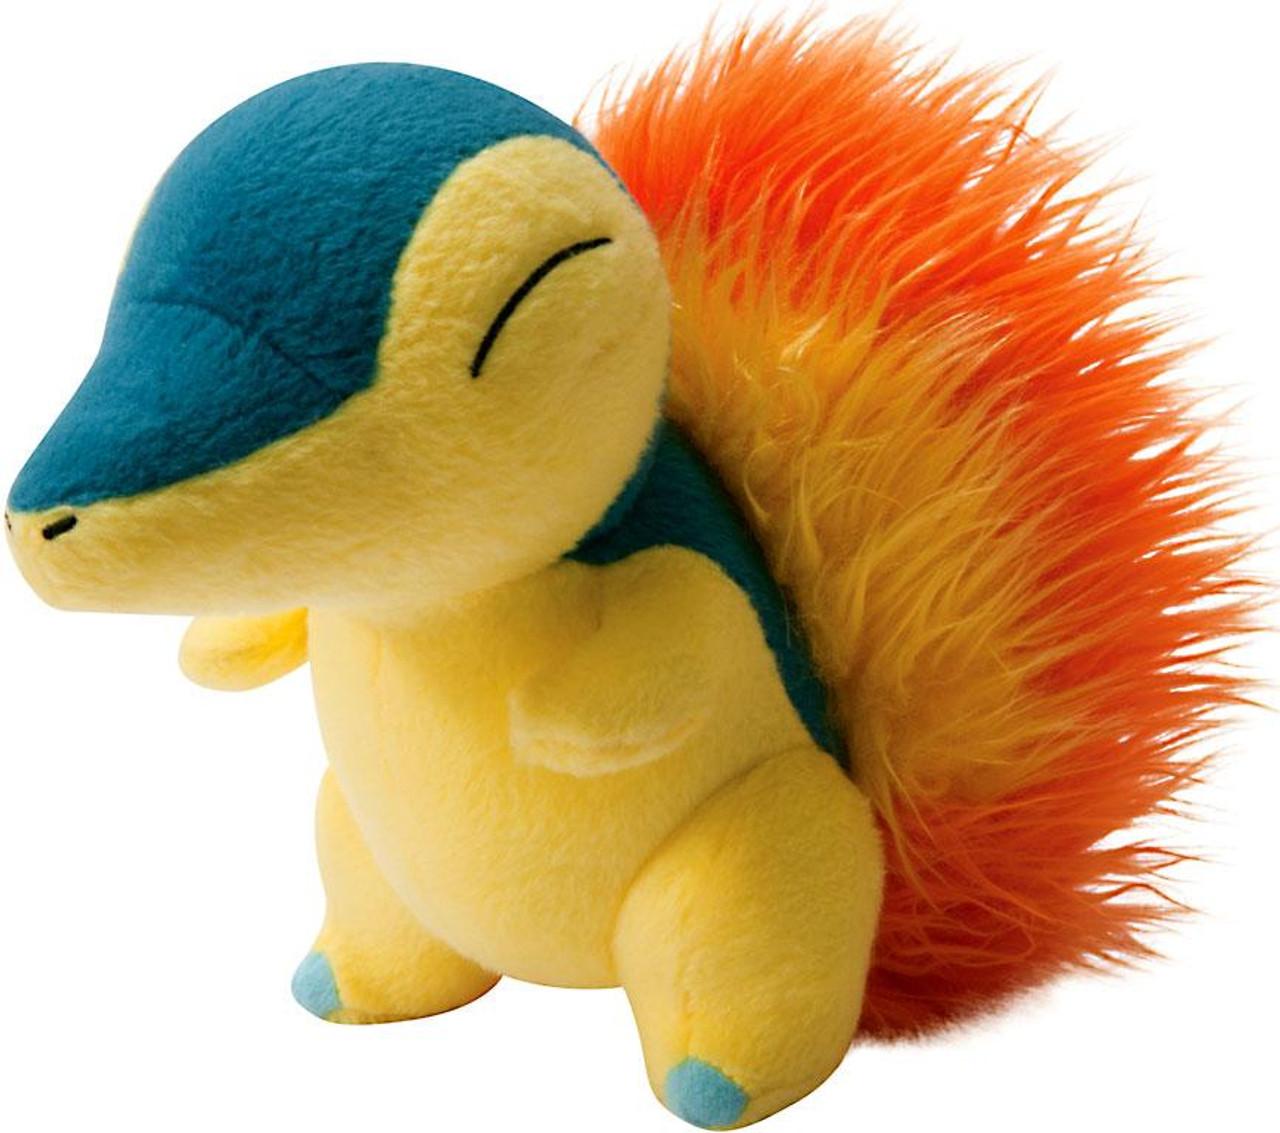 Pokemon TOMY Cyndaquil 8-Inch Trainer's Choice Plush